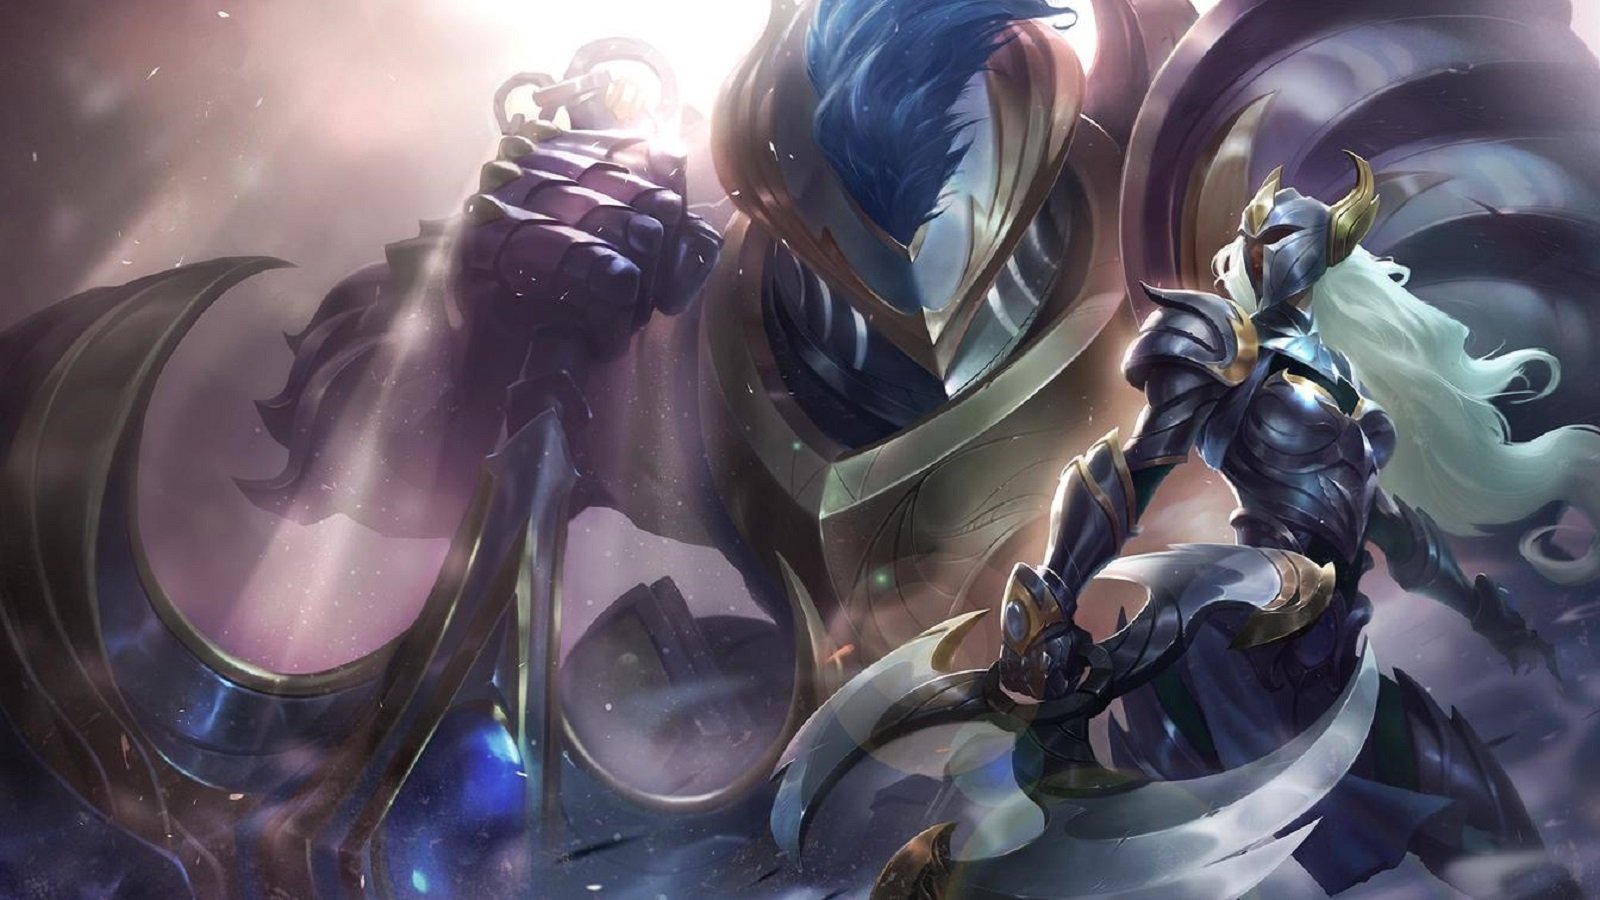 League of Legends Sivir and Nautilus Warden skins wallpaper 1600x900 1600x900